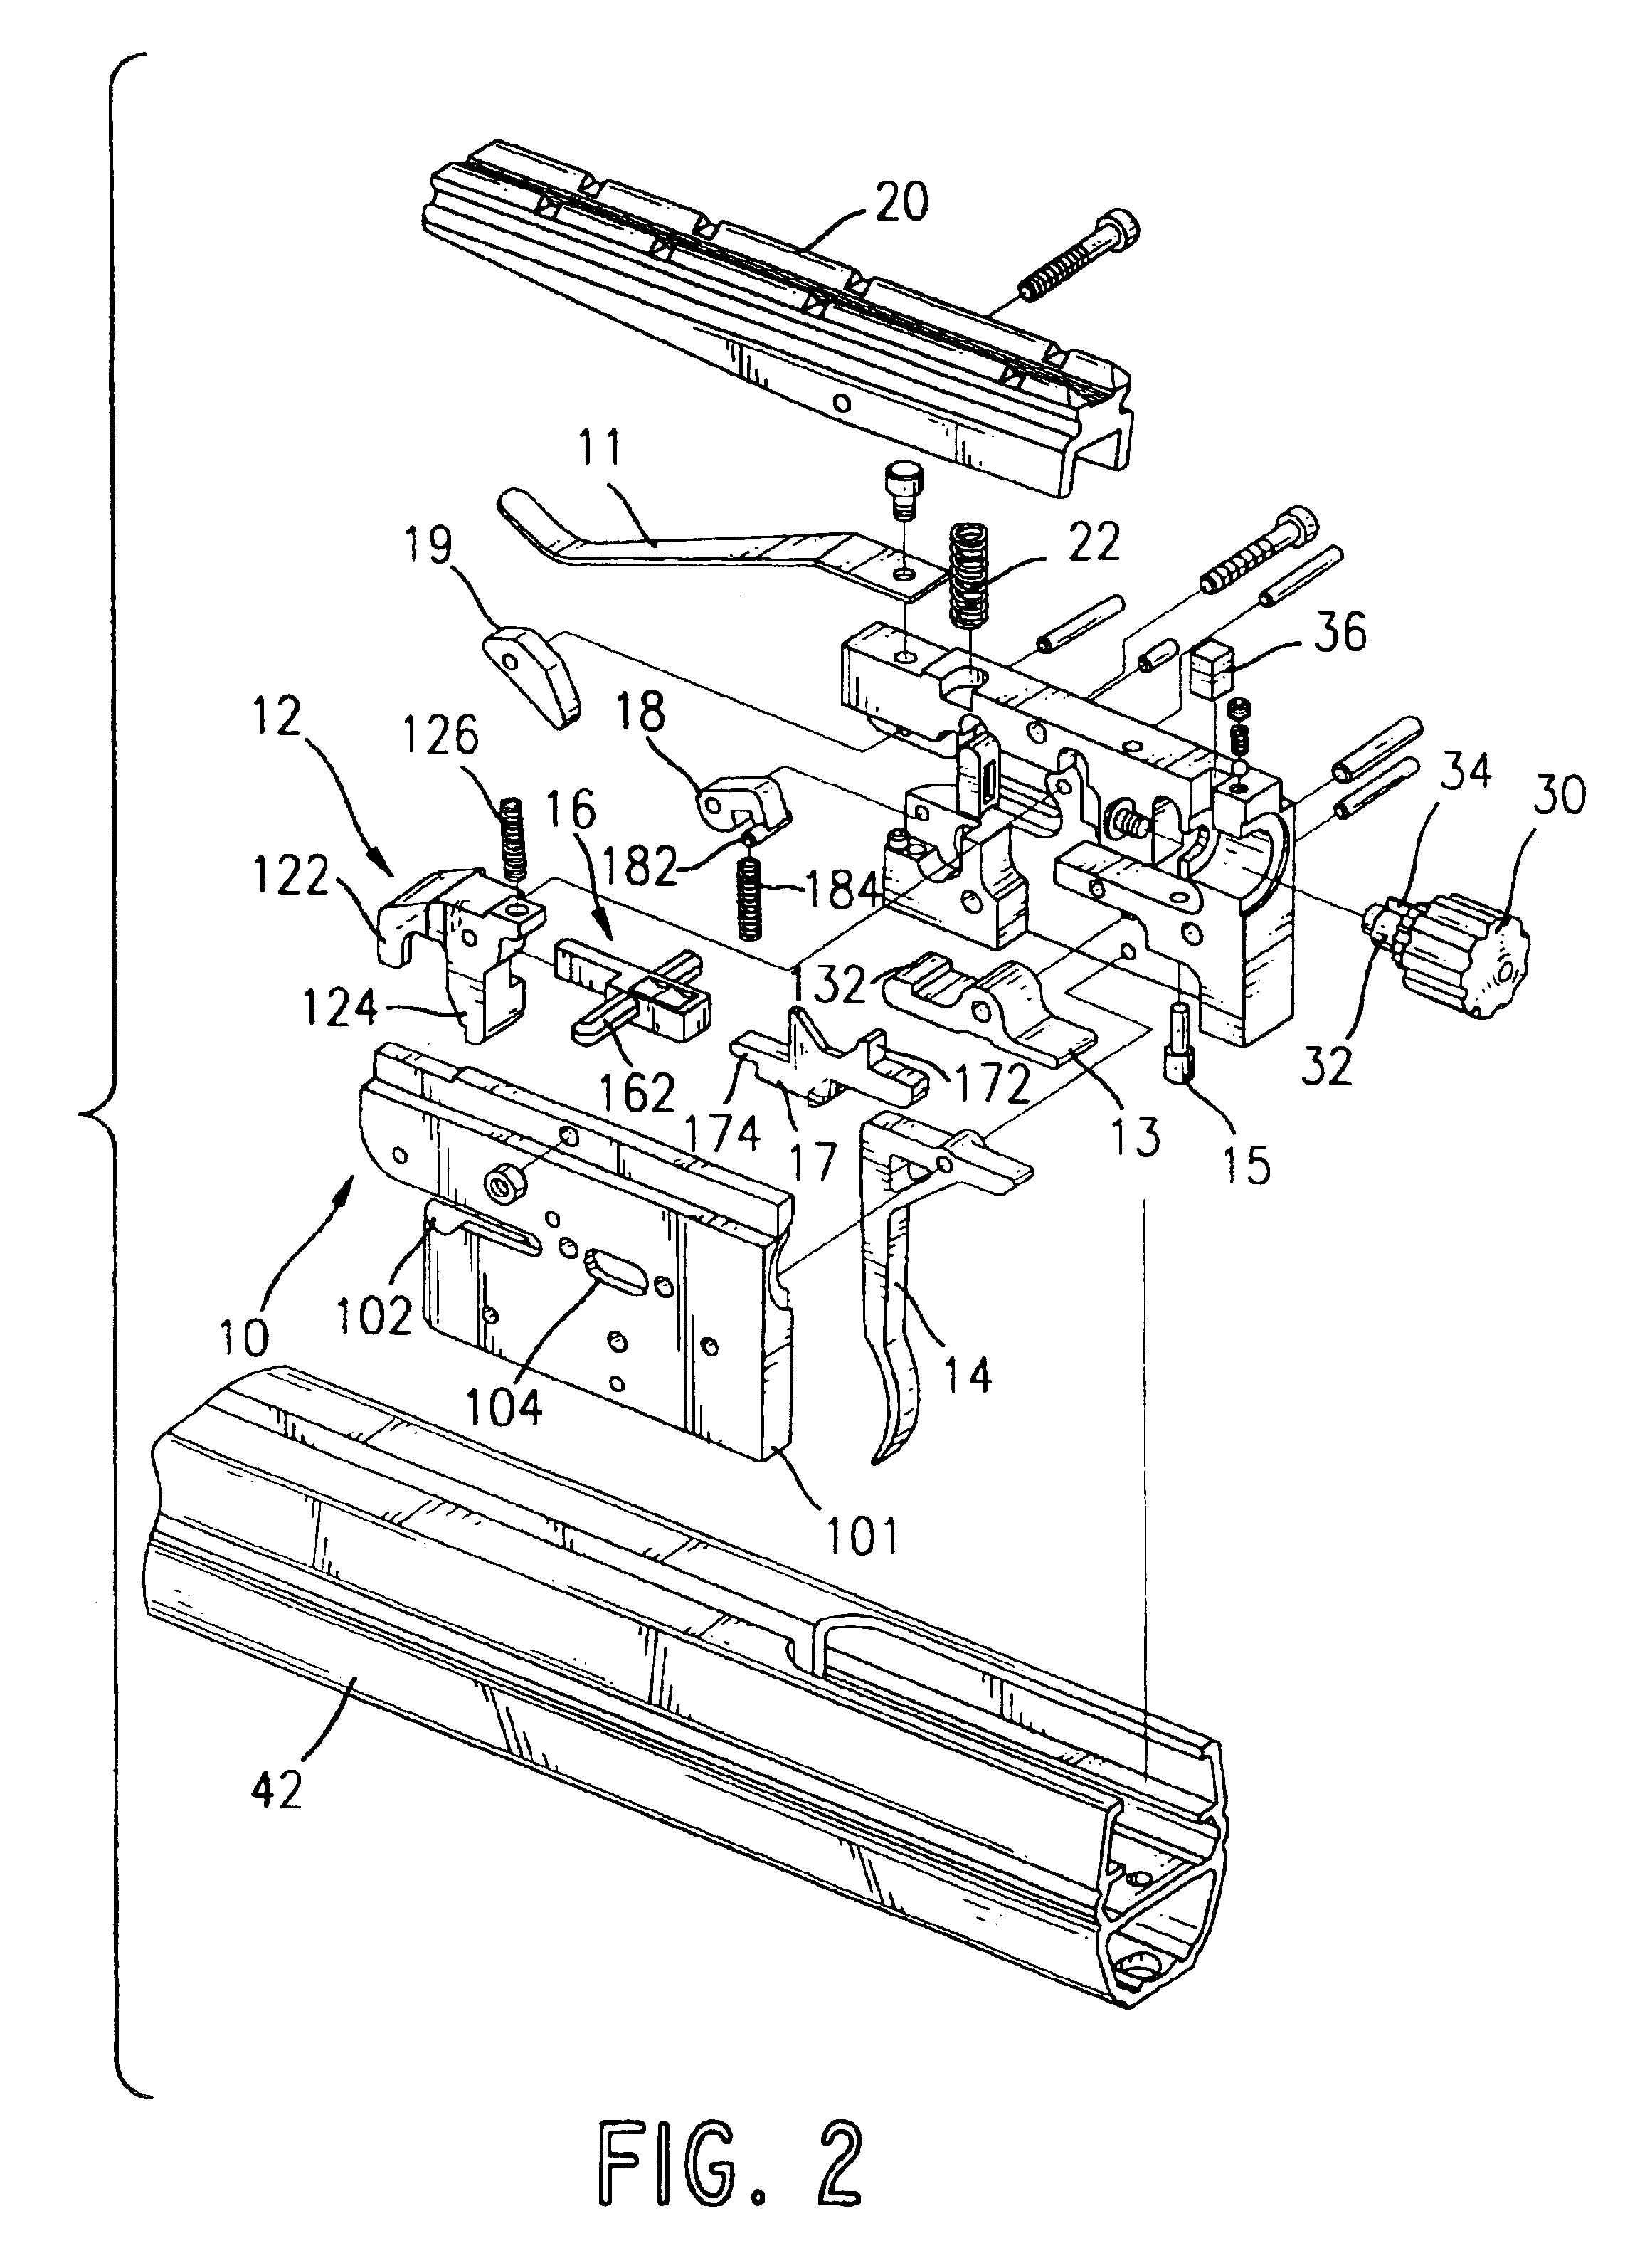 Horton Crossbow Parts Diagram - Illustration Of Wiring Diagram •